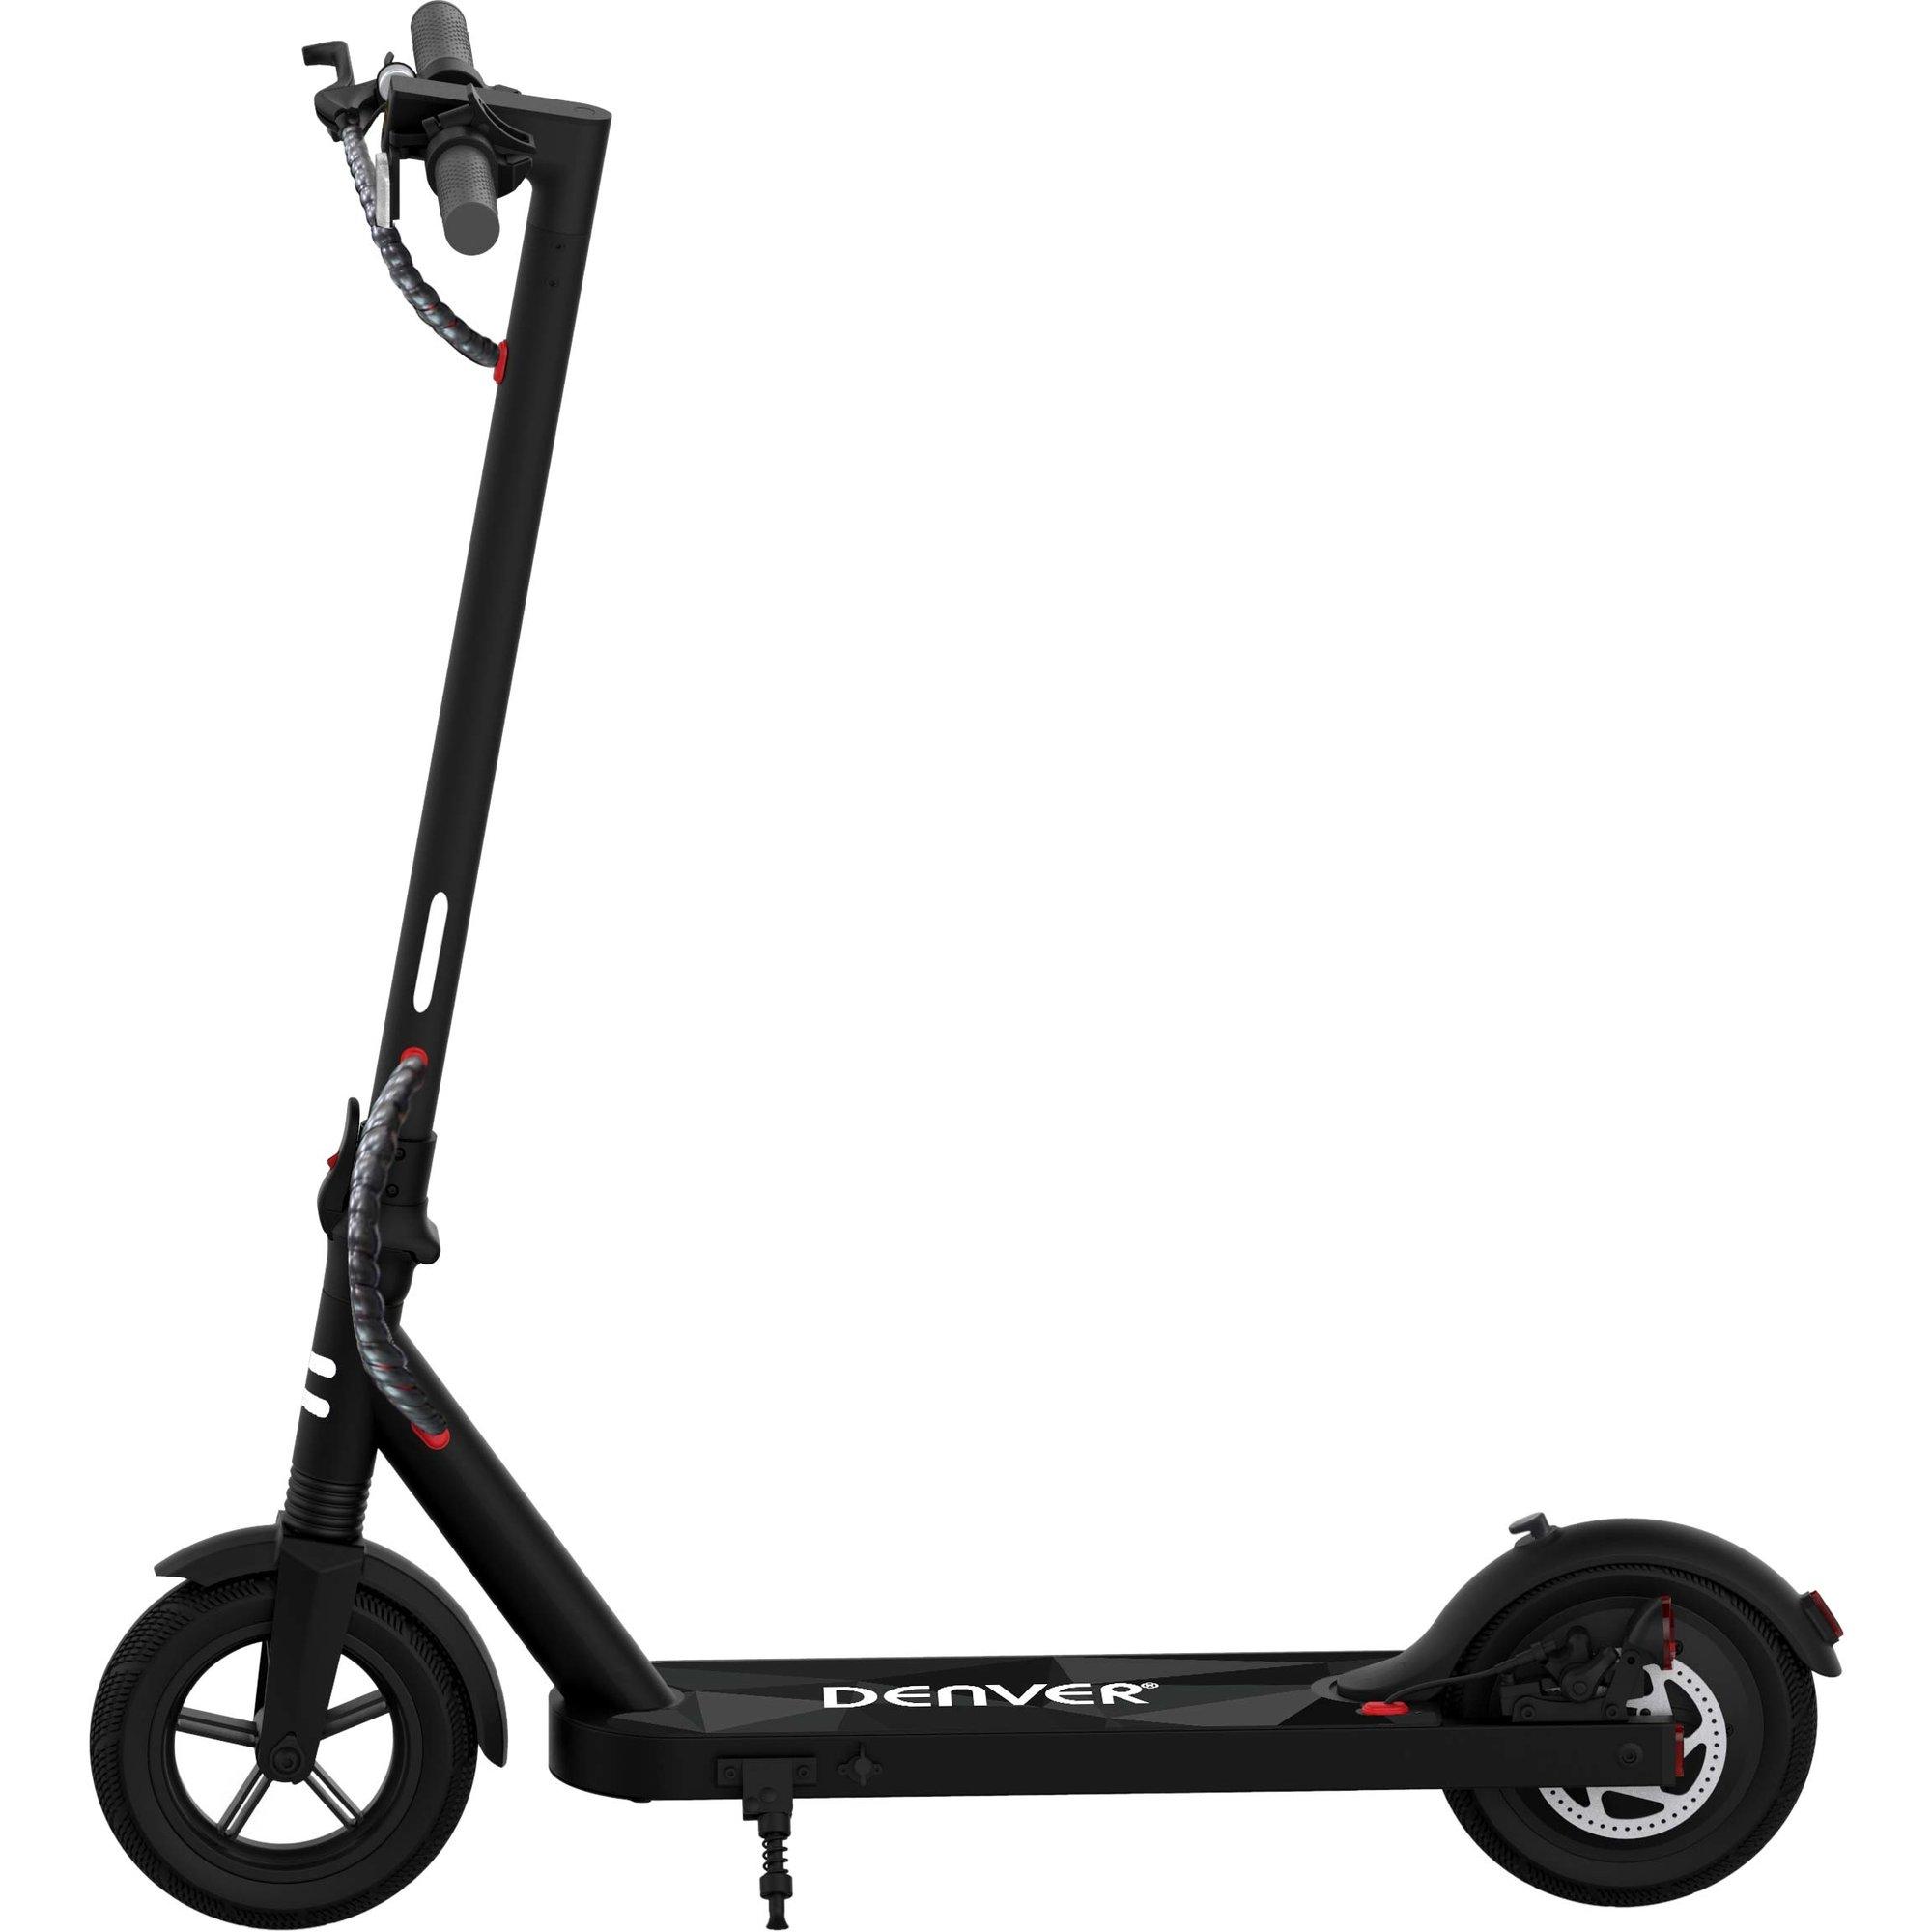 Denver SCO-85350 elektrisk scooter svart